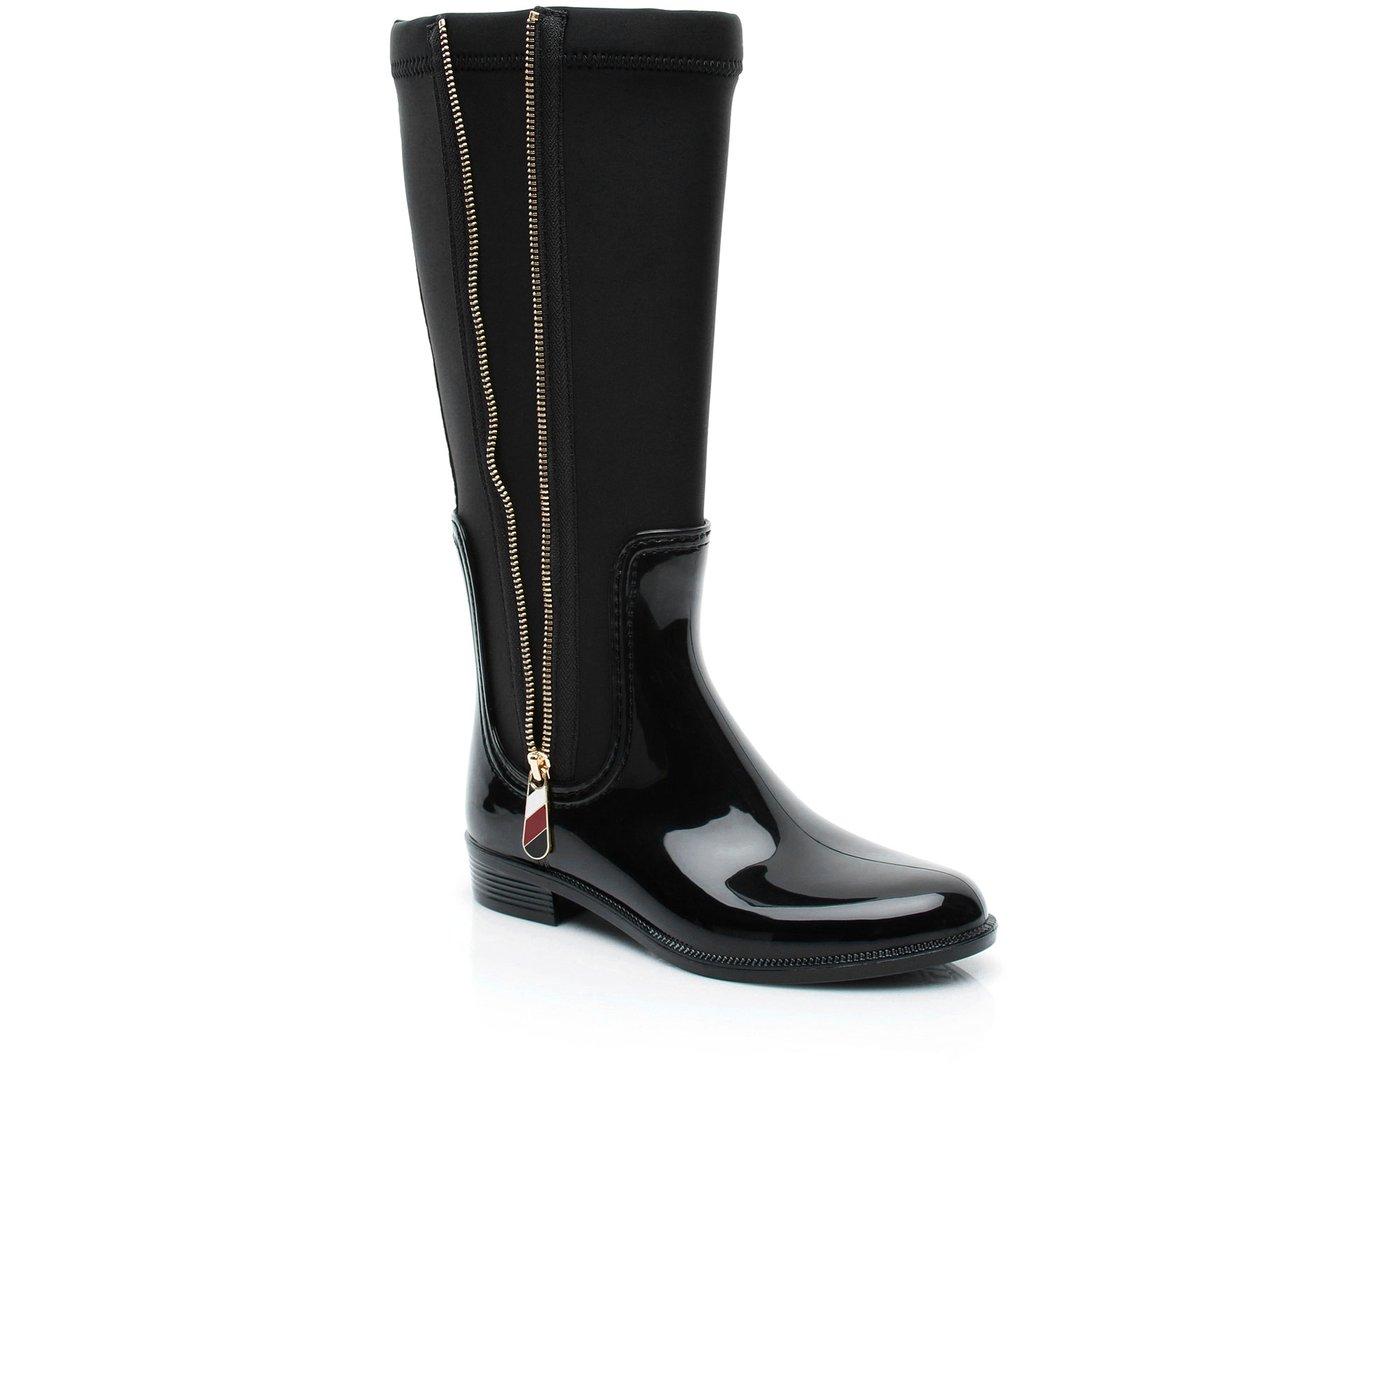 Tommy Hilfiger Kadın Siyah Yağmur Botu